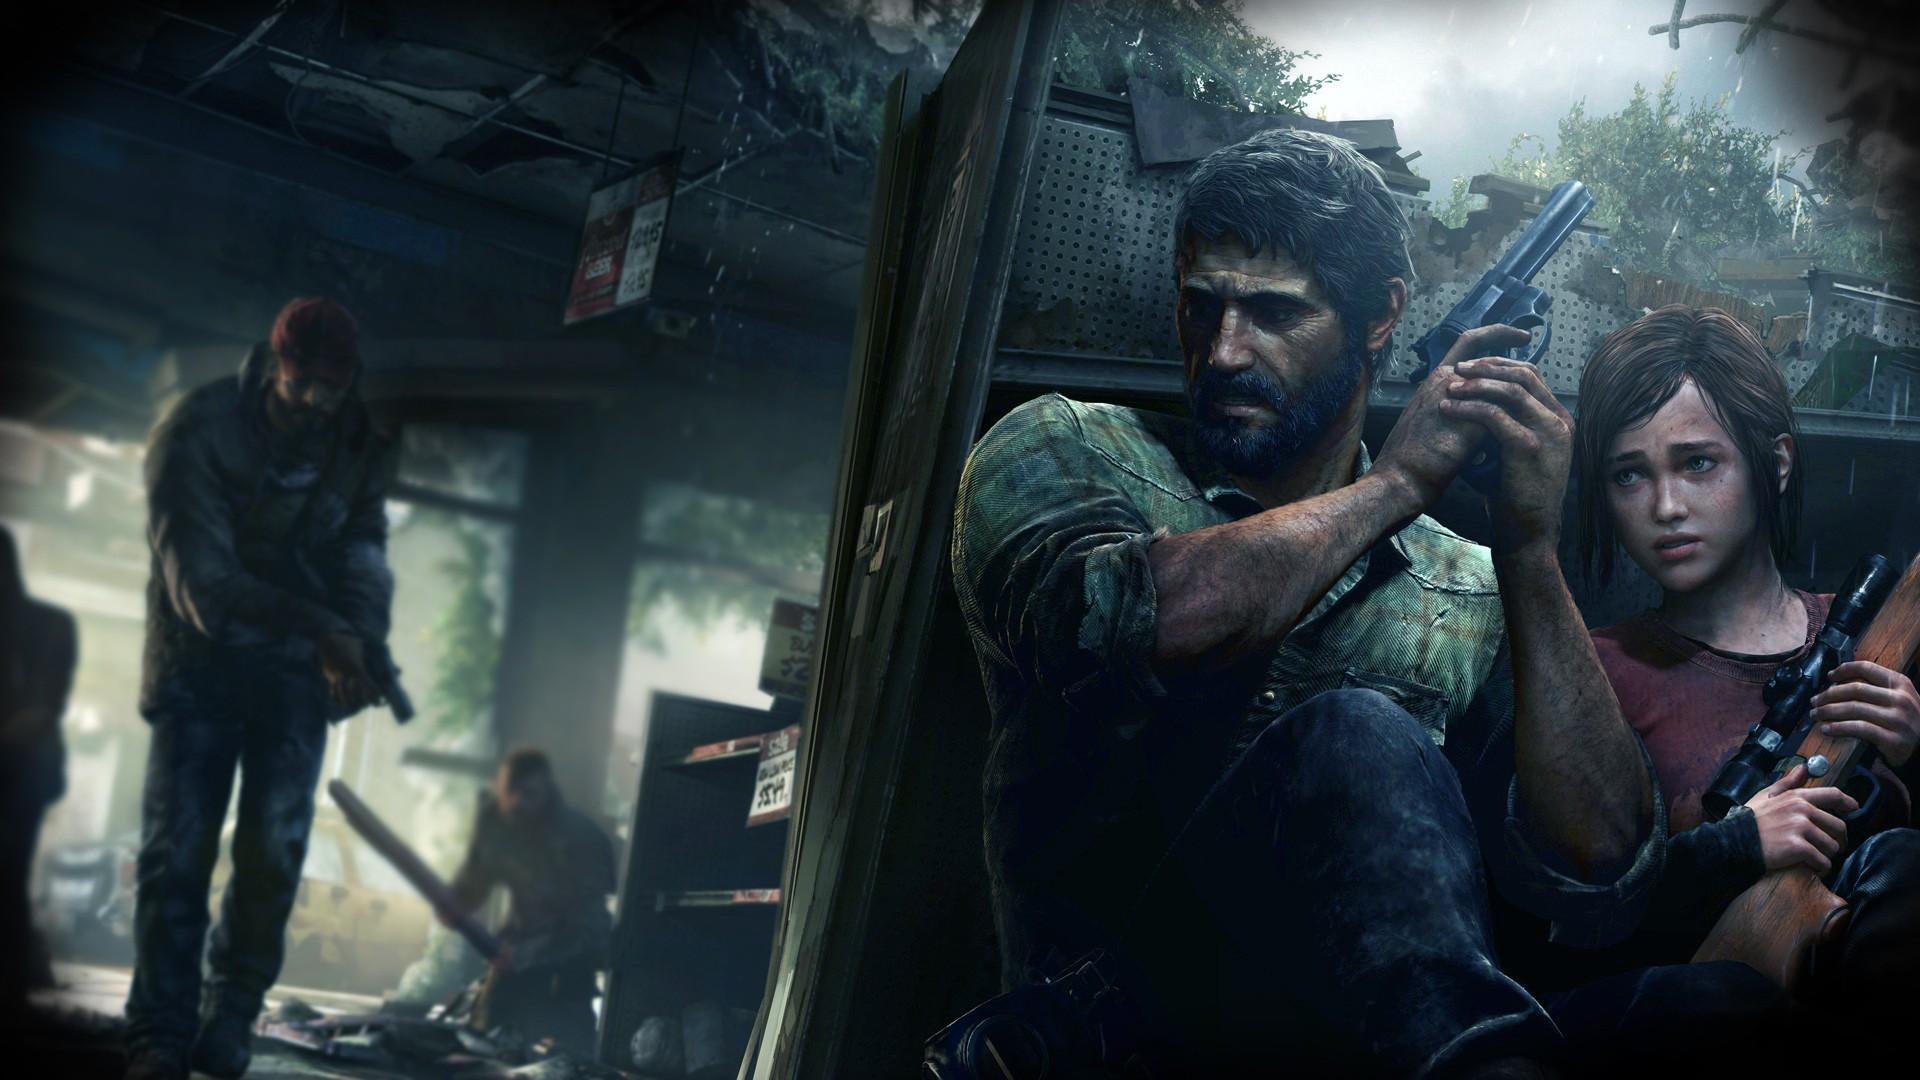 HBO เตรียมทำซีรีส์ The Last of Us โดย ผู้กำกับ Chernobyl นะ อิ__อิ